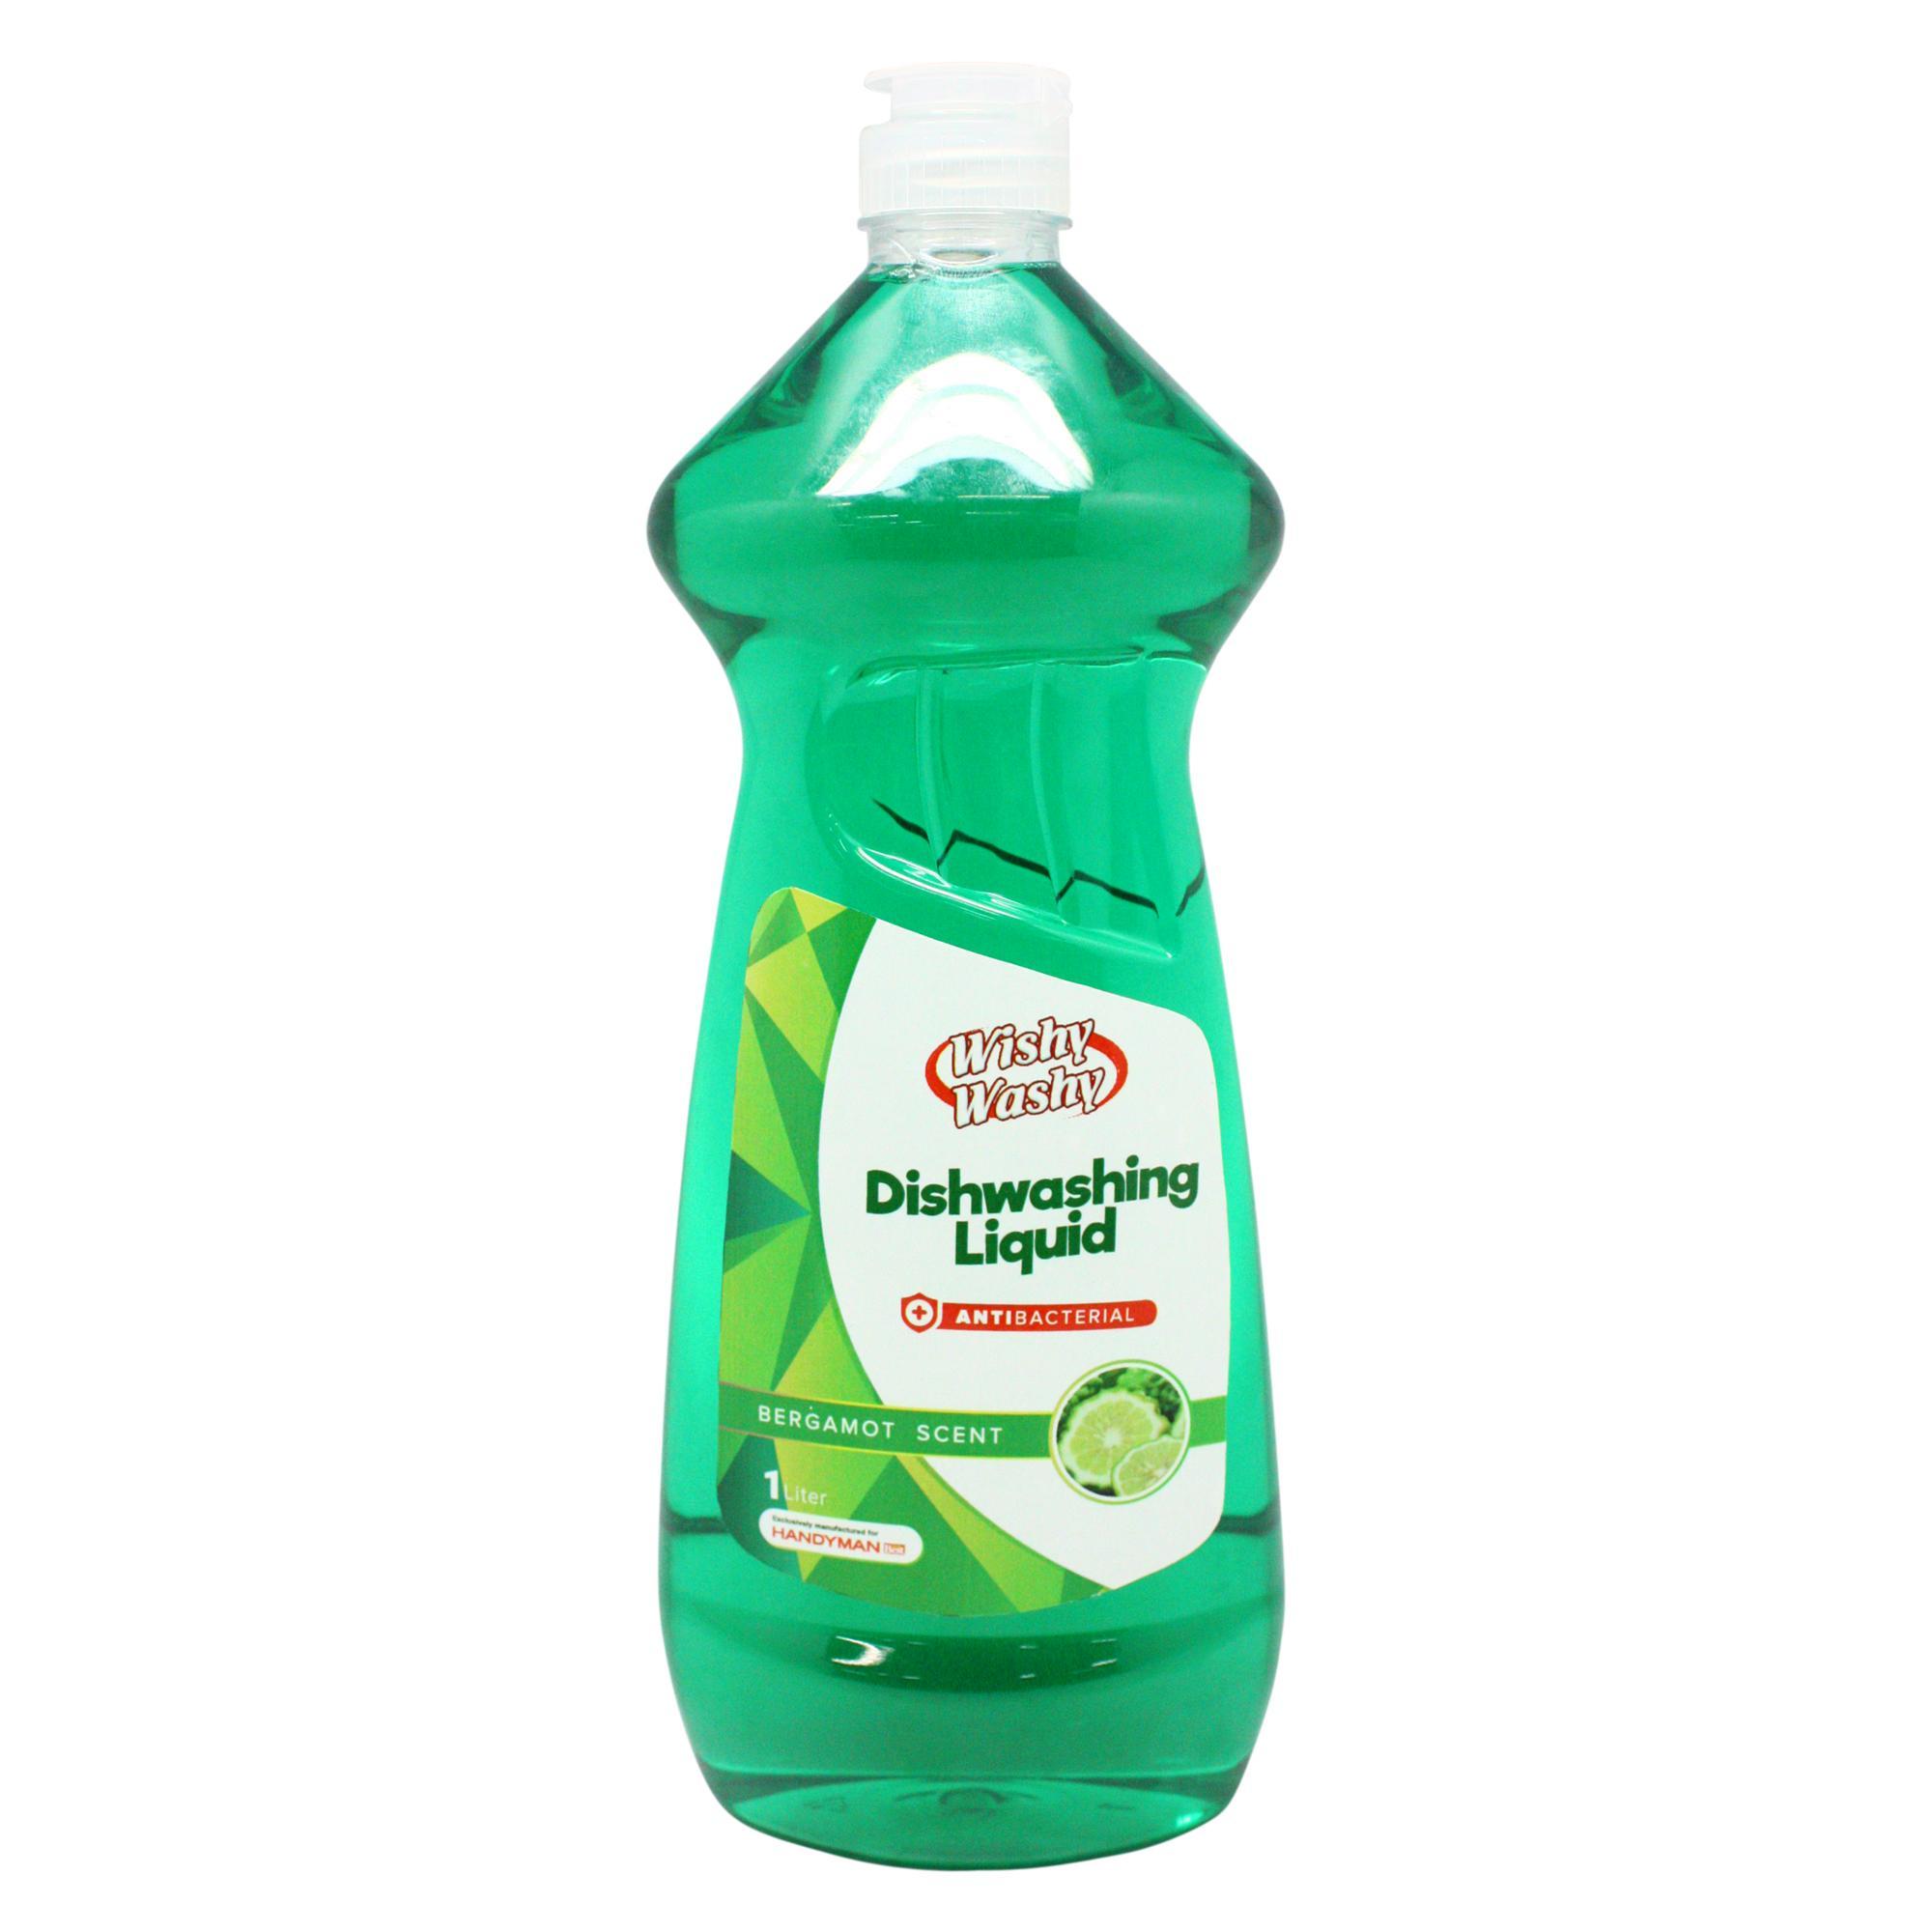 Wishy Washy Antibacterial Dishwashing Liquid With Bergamot Scent 1l By Handyman.